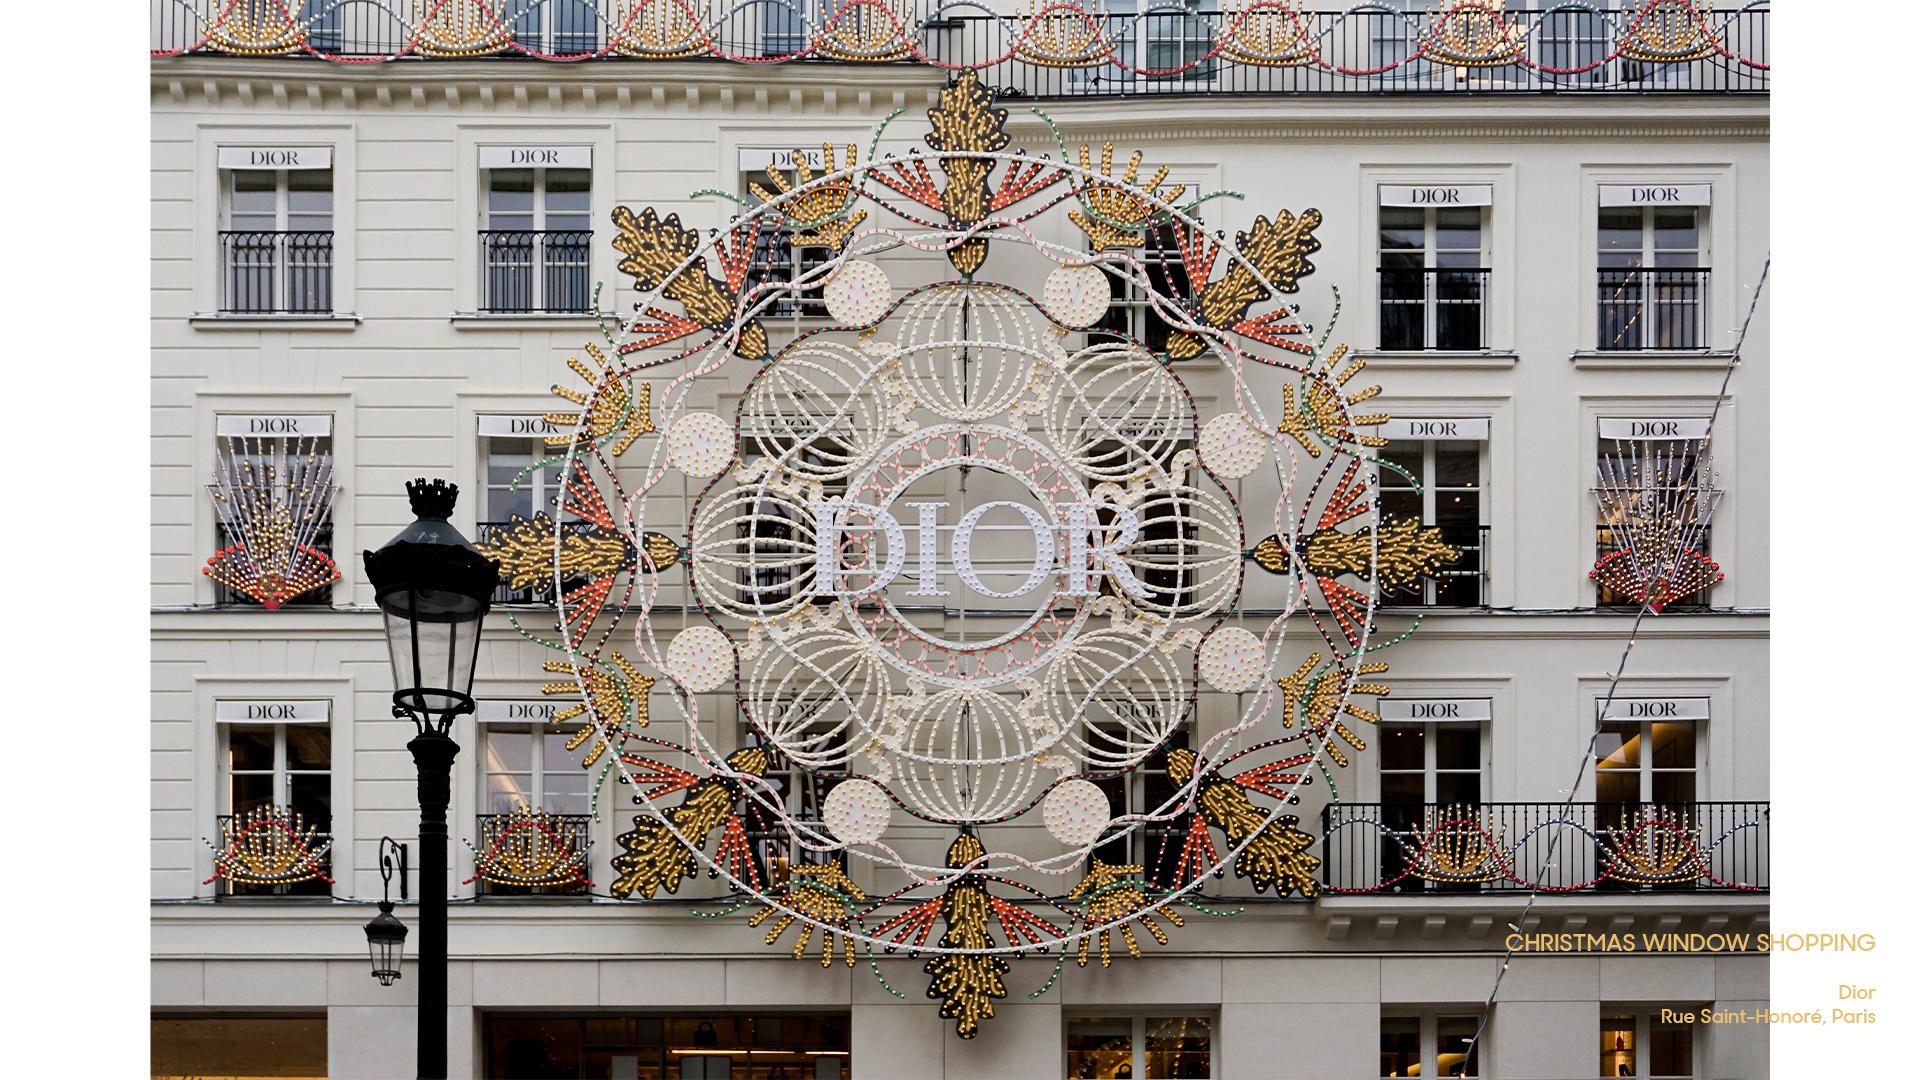 18_Dior